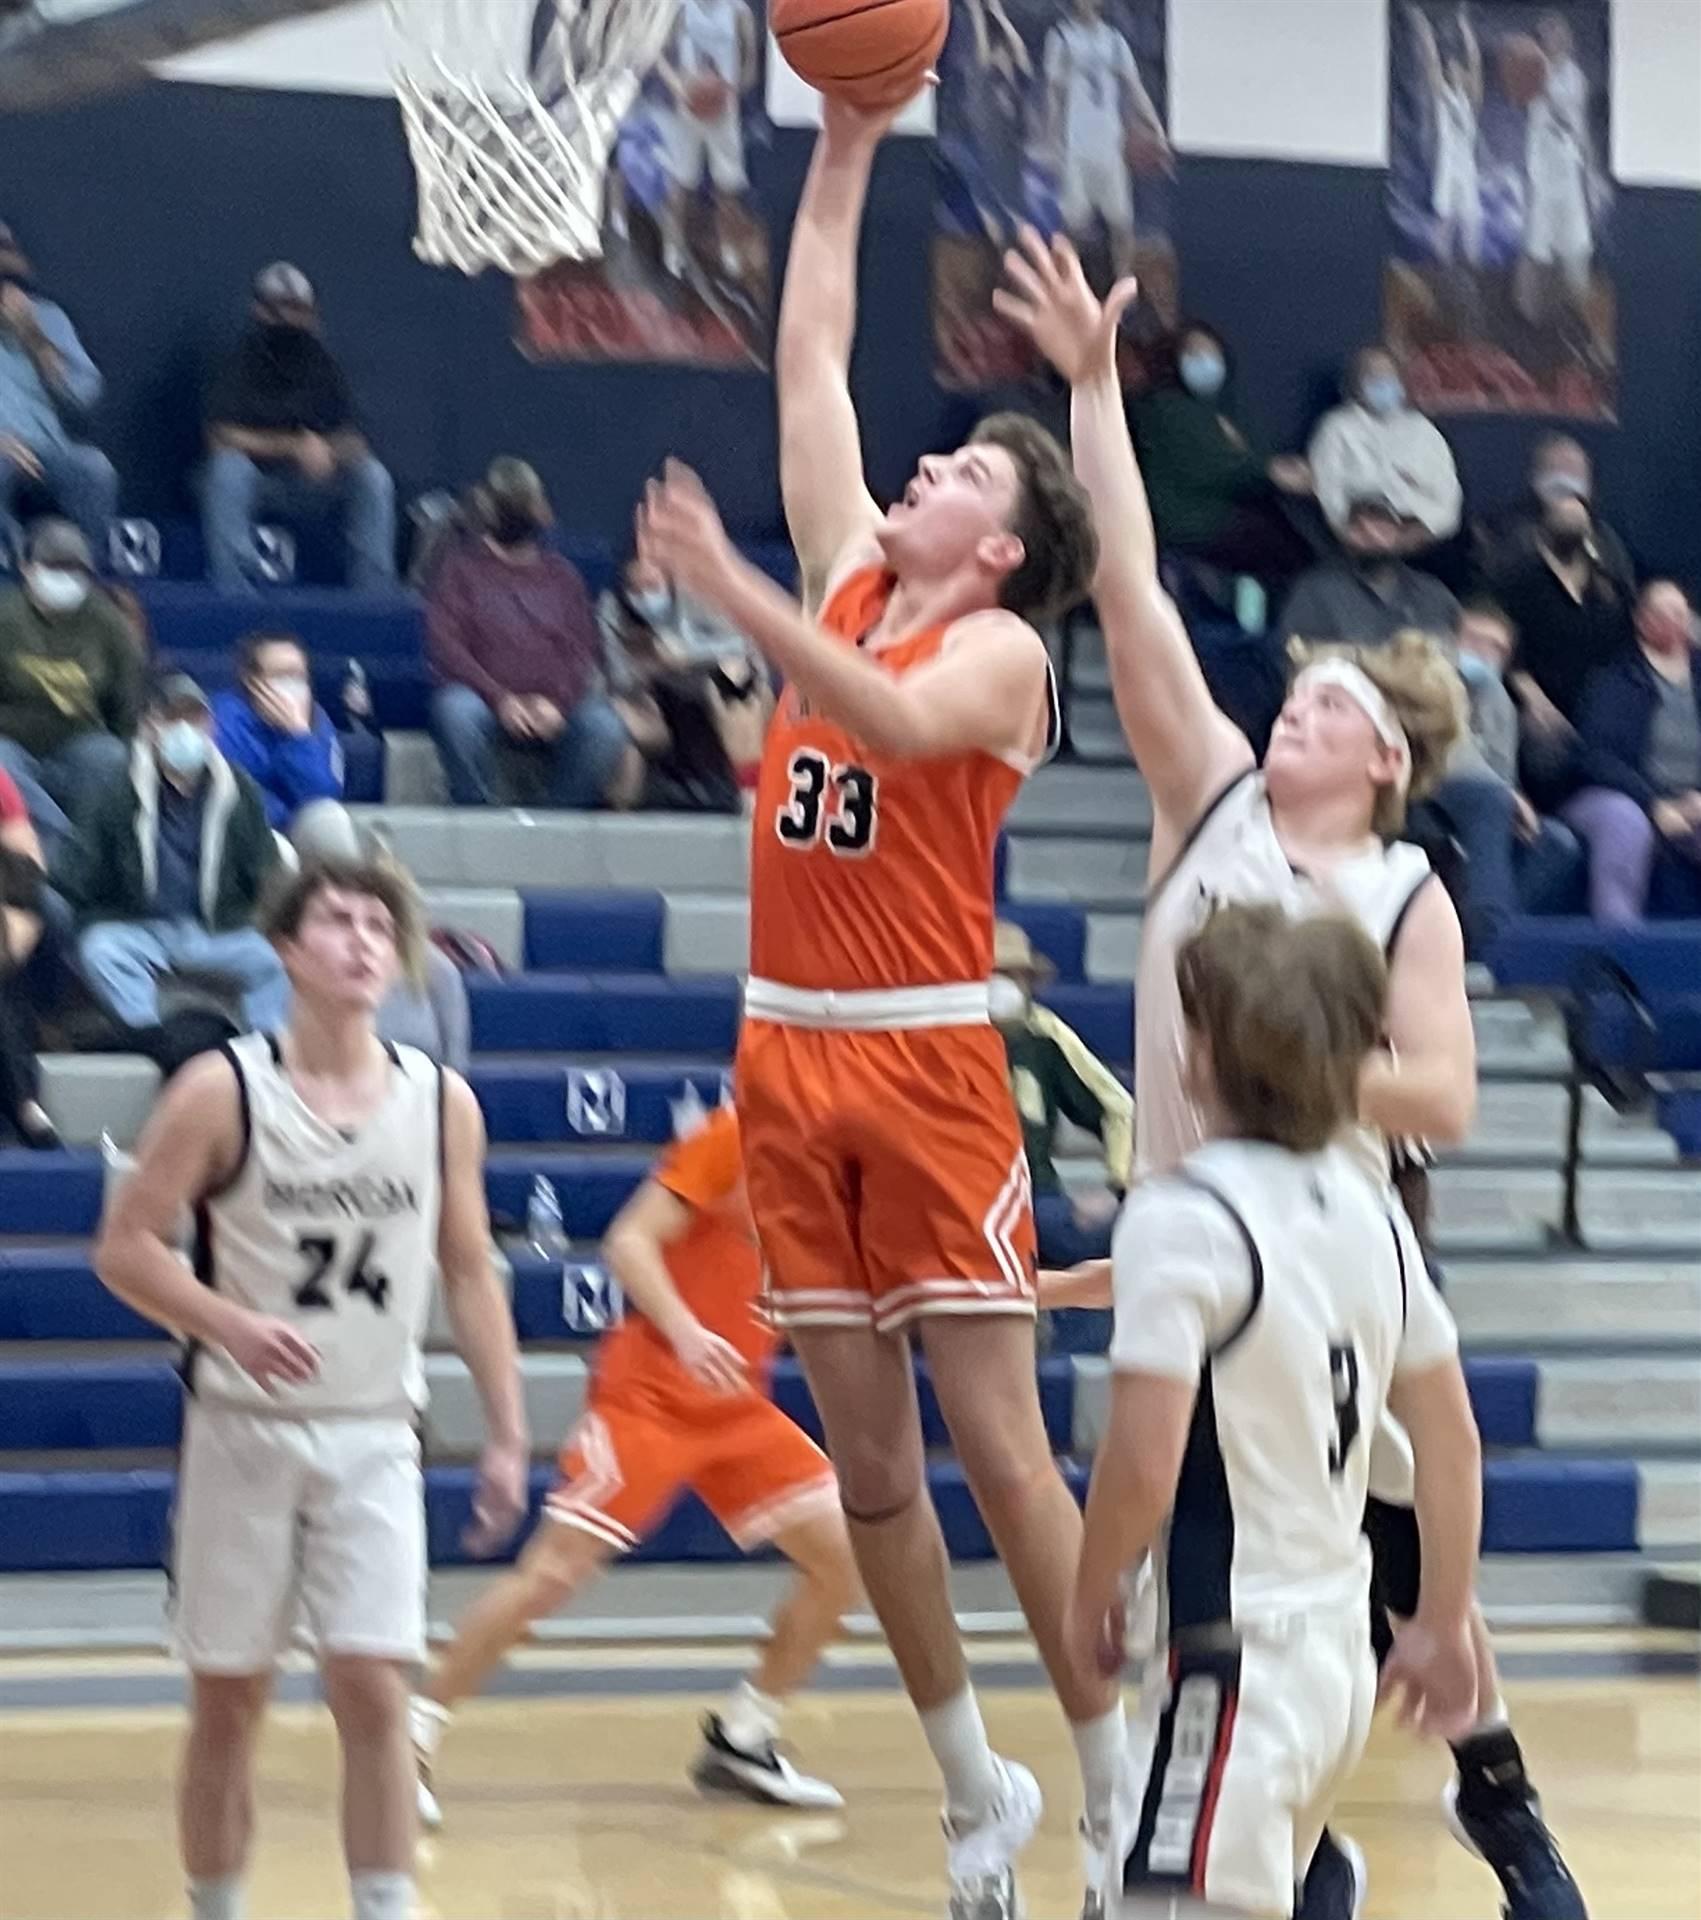 Varsity Boys Basketball taking on Morgan